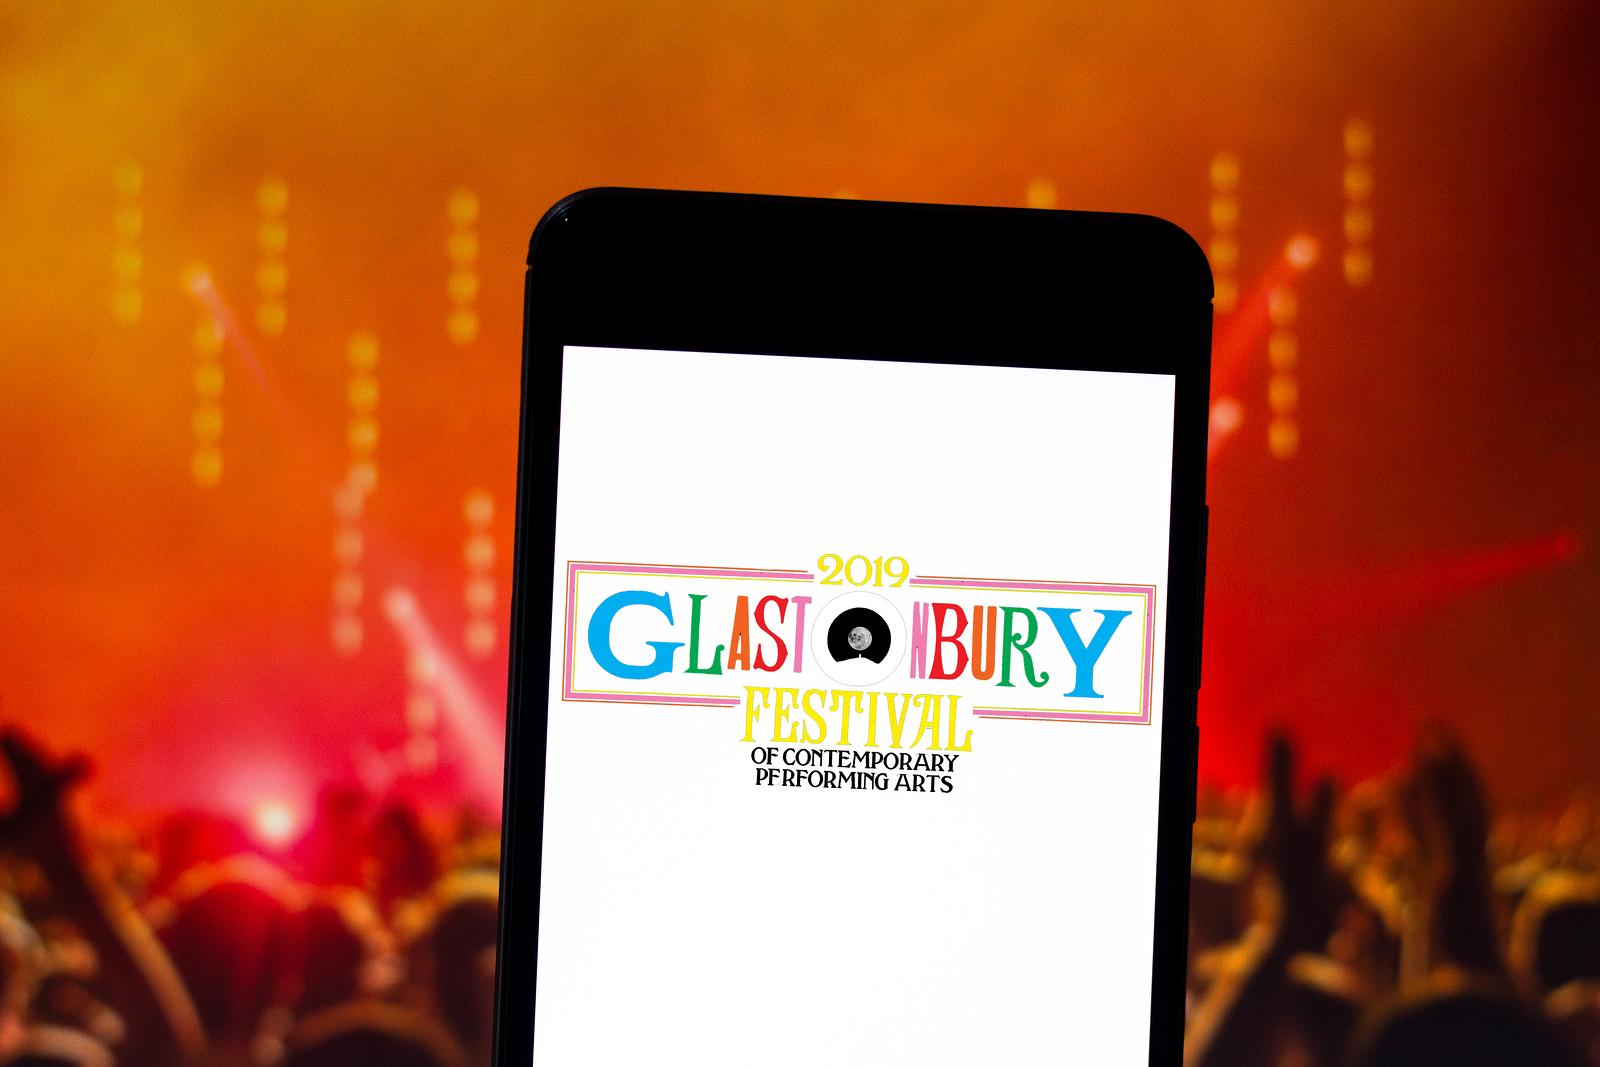 Full Glastonbury Line-Up Announced